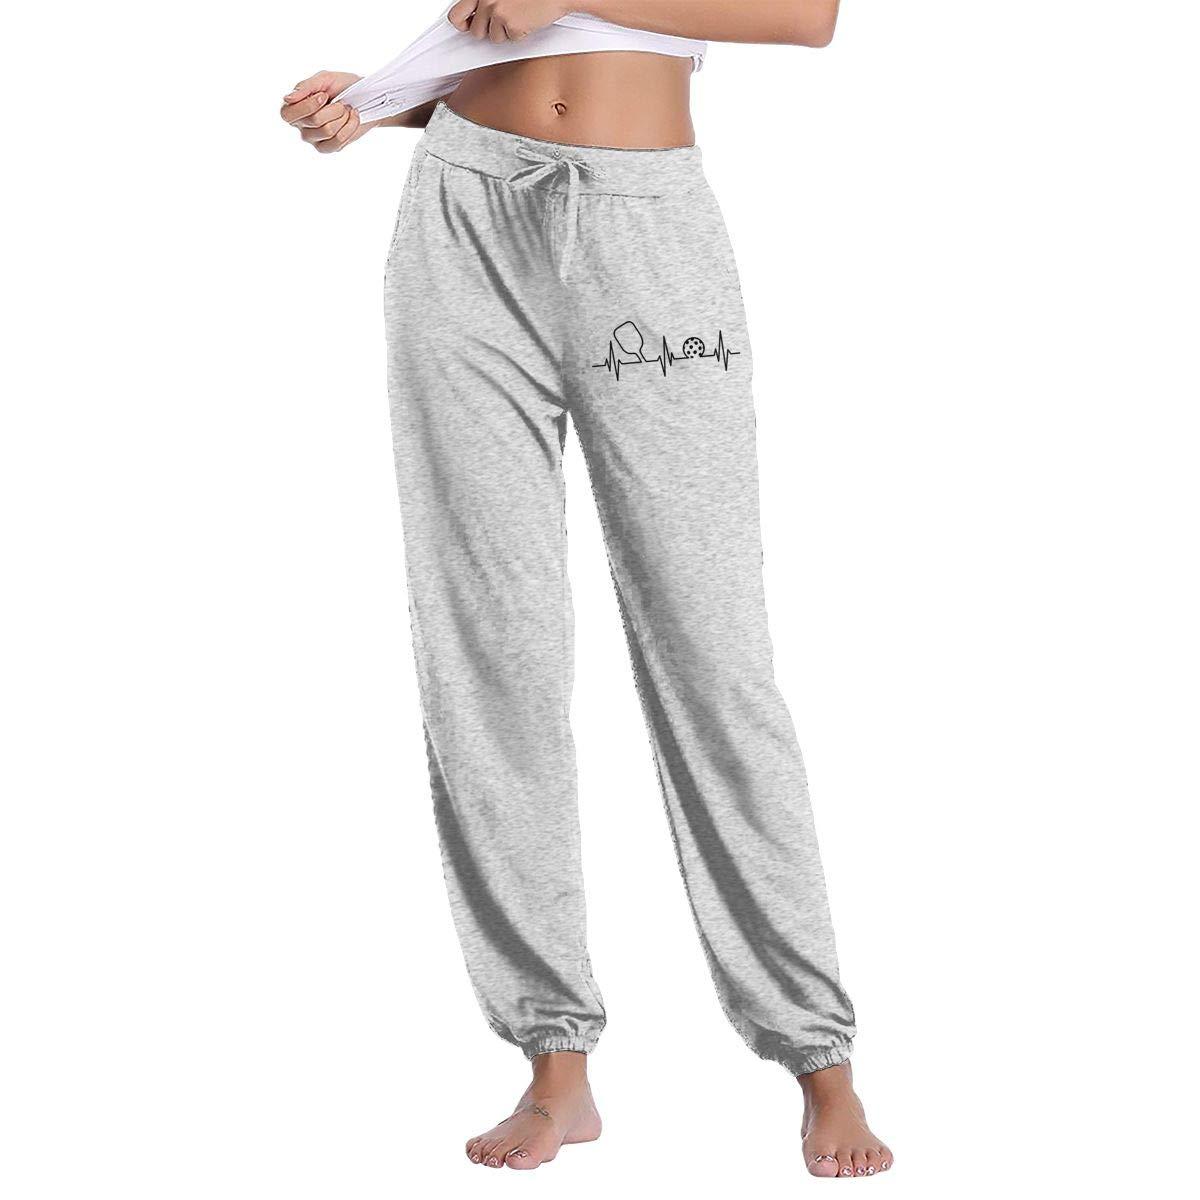 YOOJPC6 Women's Pickleball Heartbeat Sweatpants with Pockets Drawstring Pants